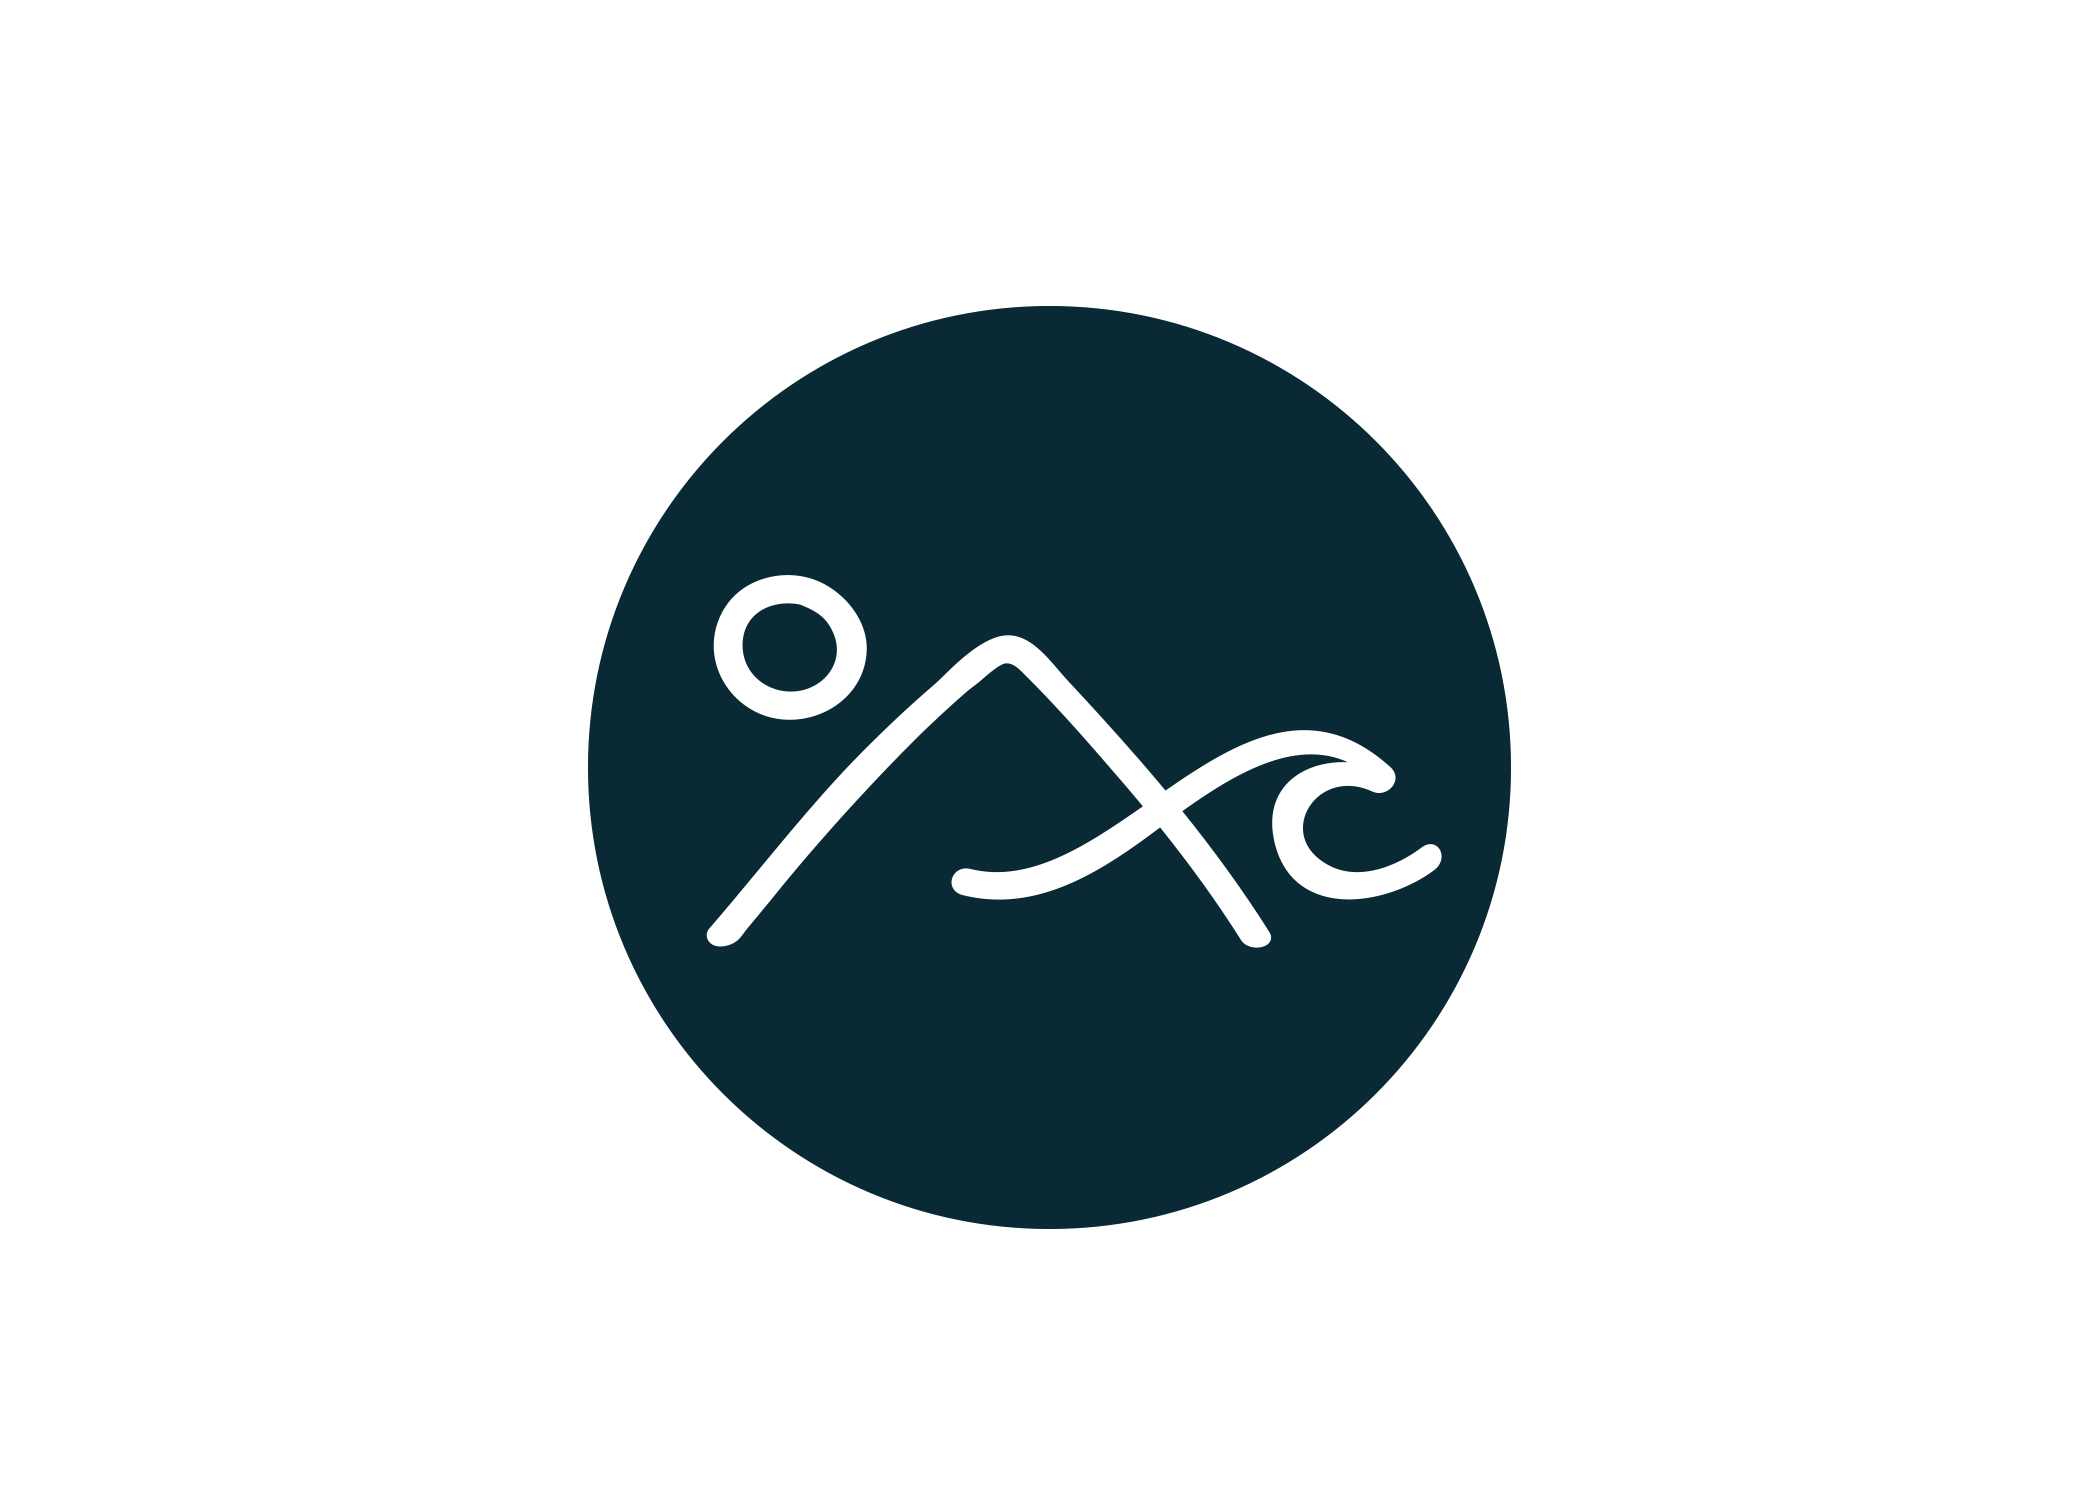 Design by Good South / Bit & Grain Logo Mark Design